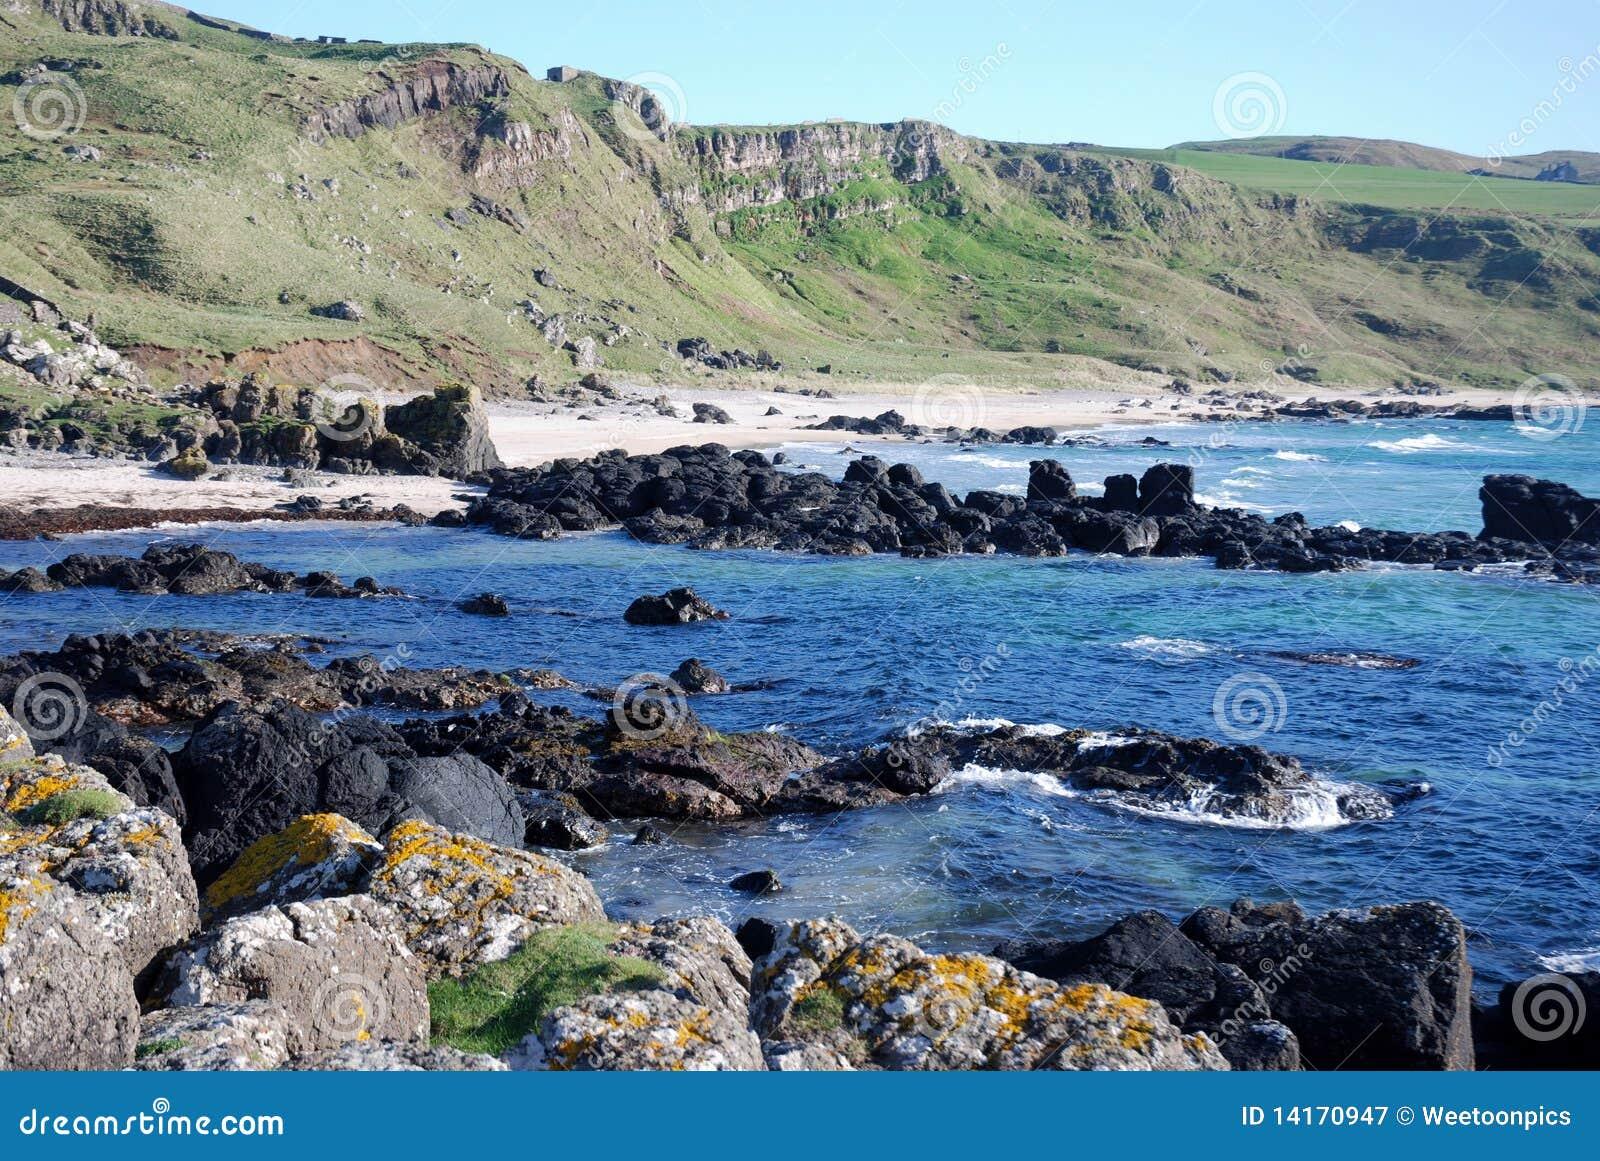 Rugged Coast of Machrihanish.